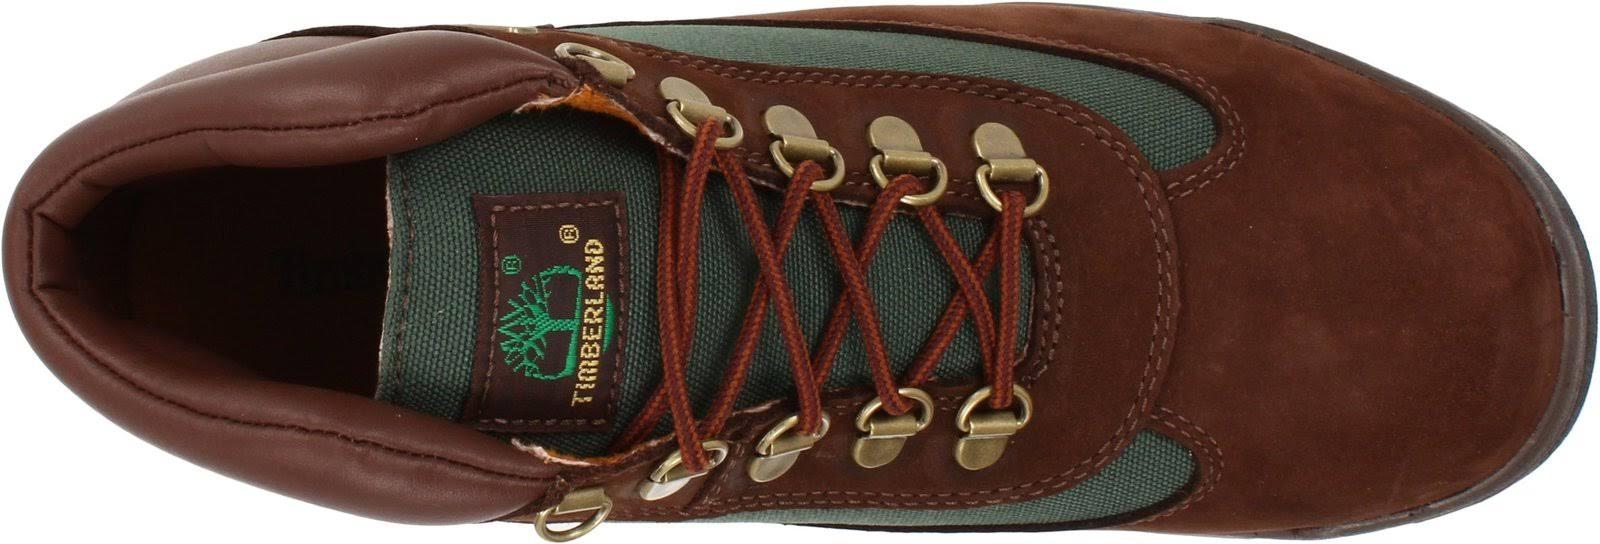 Timberland Timberland Timberland Toddler Timberland Toddler Field Boot Boot Field Toddler Field Boot thCrdsQ